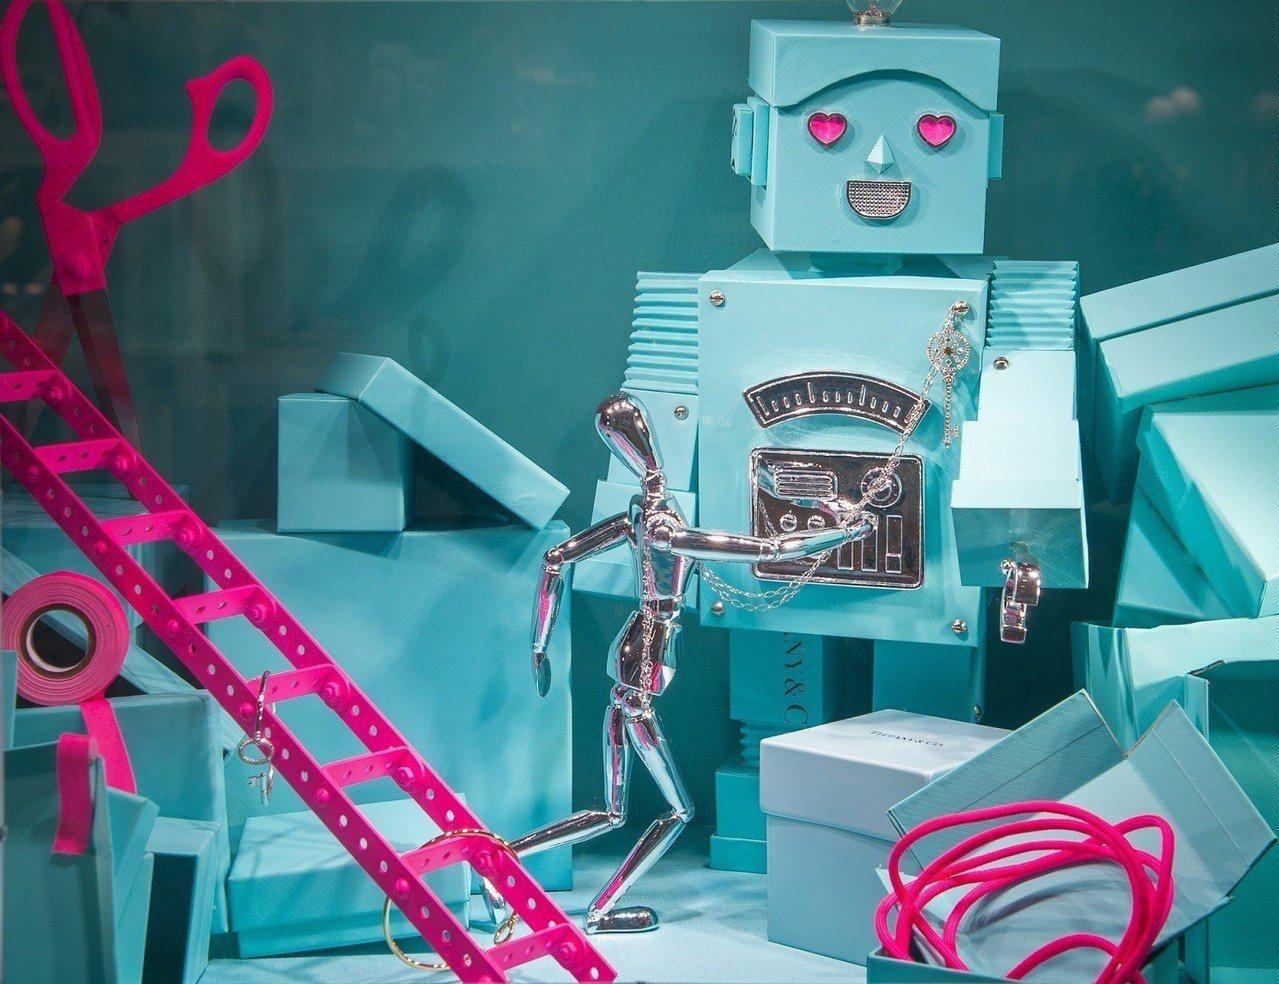 Tiffany 節慶櫥窗重現60年代金屬人偶,充滿童趣。圖/Tiffany提供